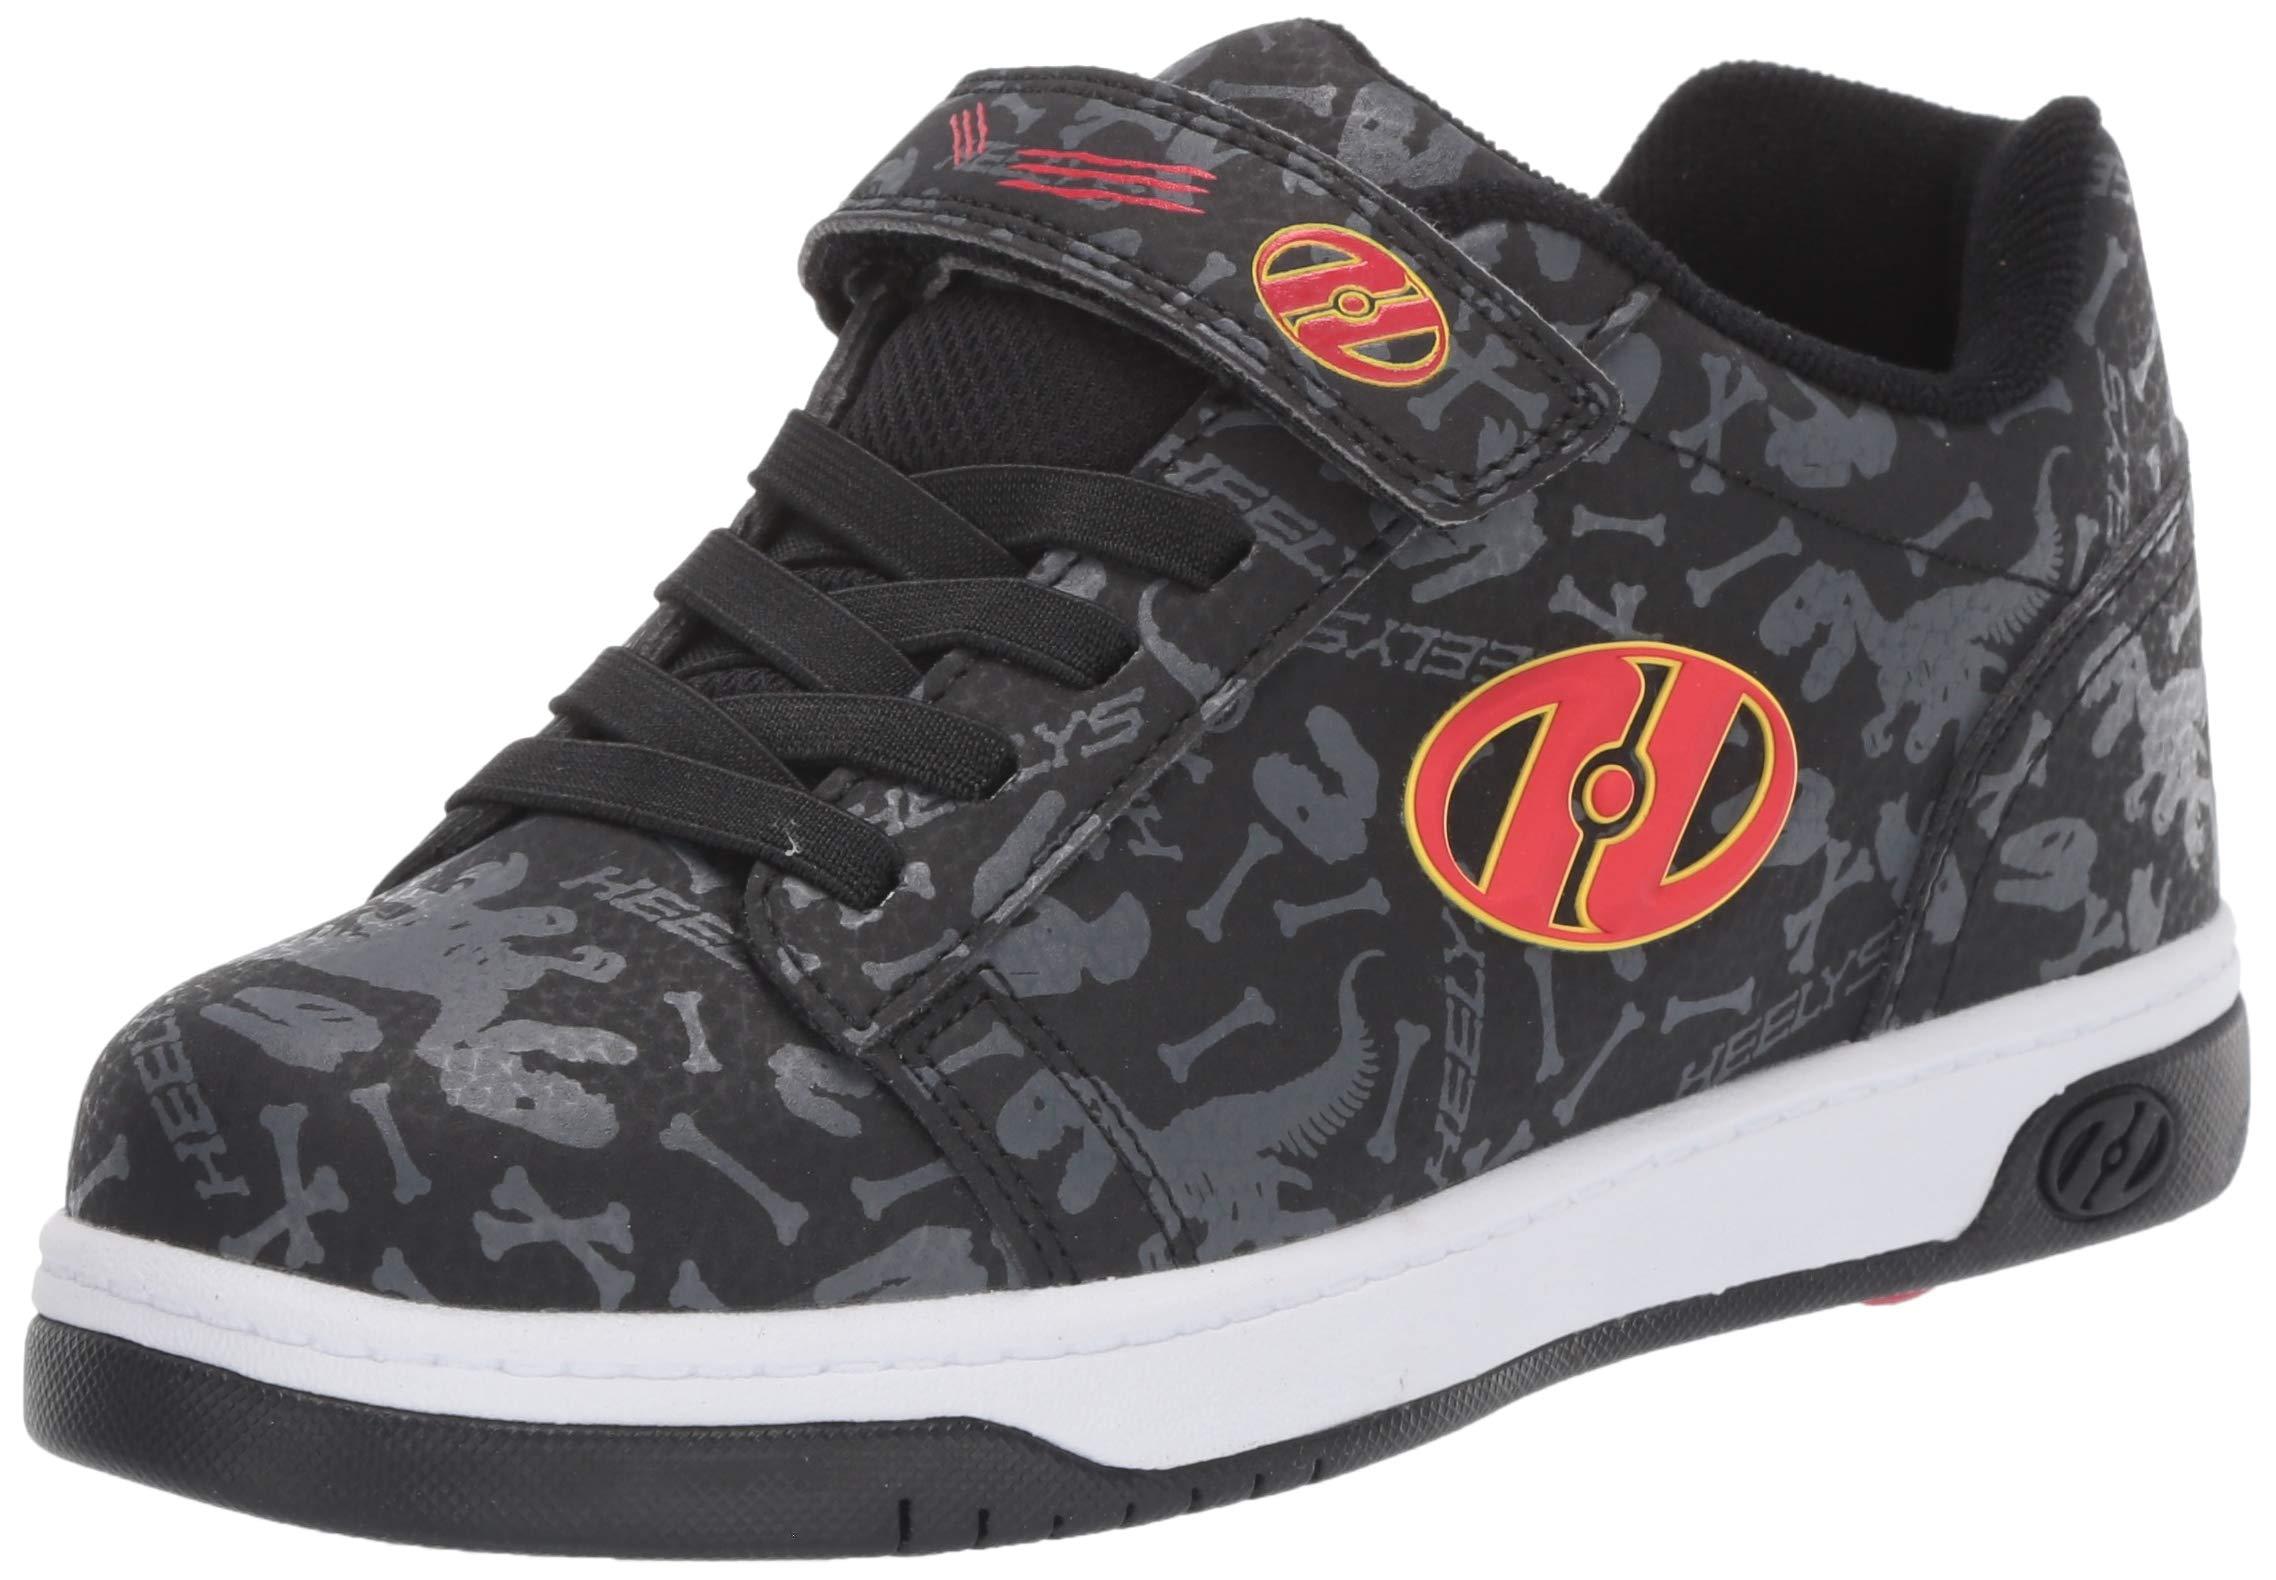 Heelys Boys' Dual Up X2 Tennis Shoe, Black/Grey/RED/Dino, 1 M US Little Kid